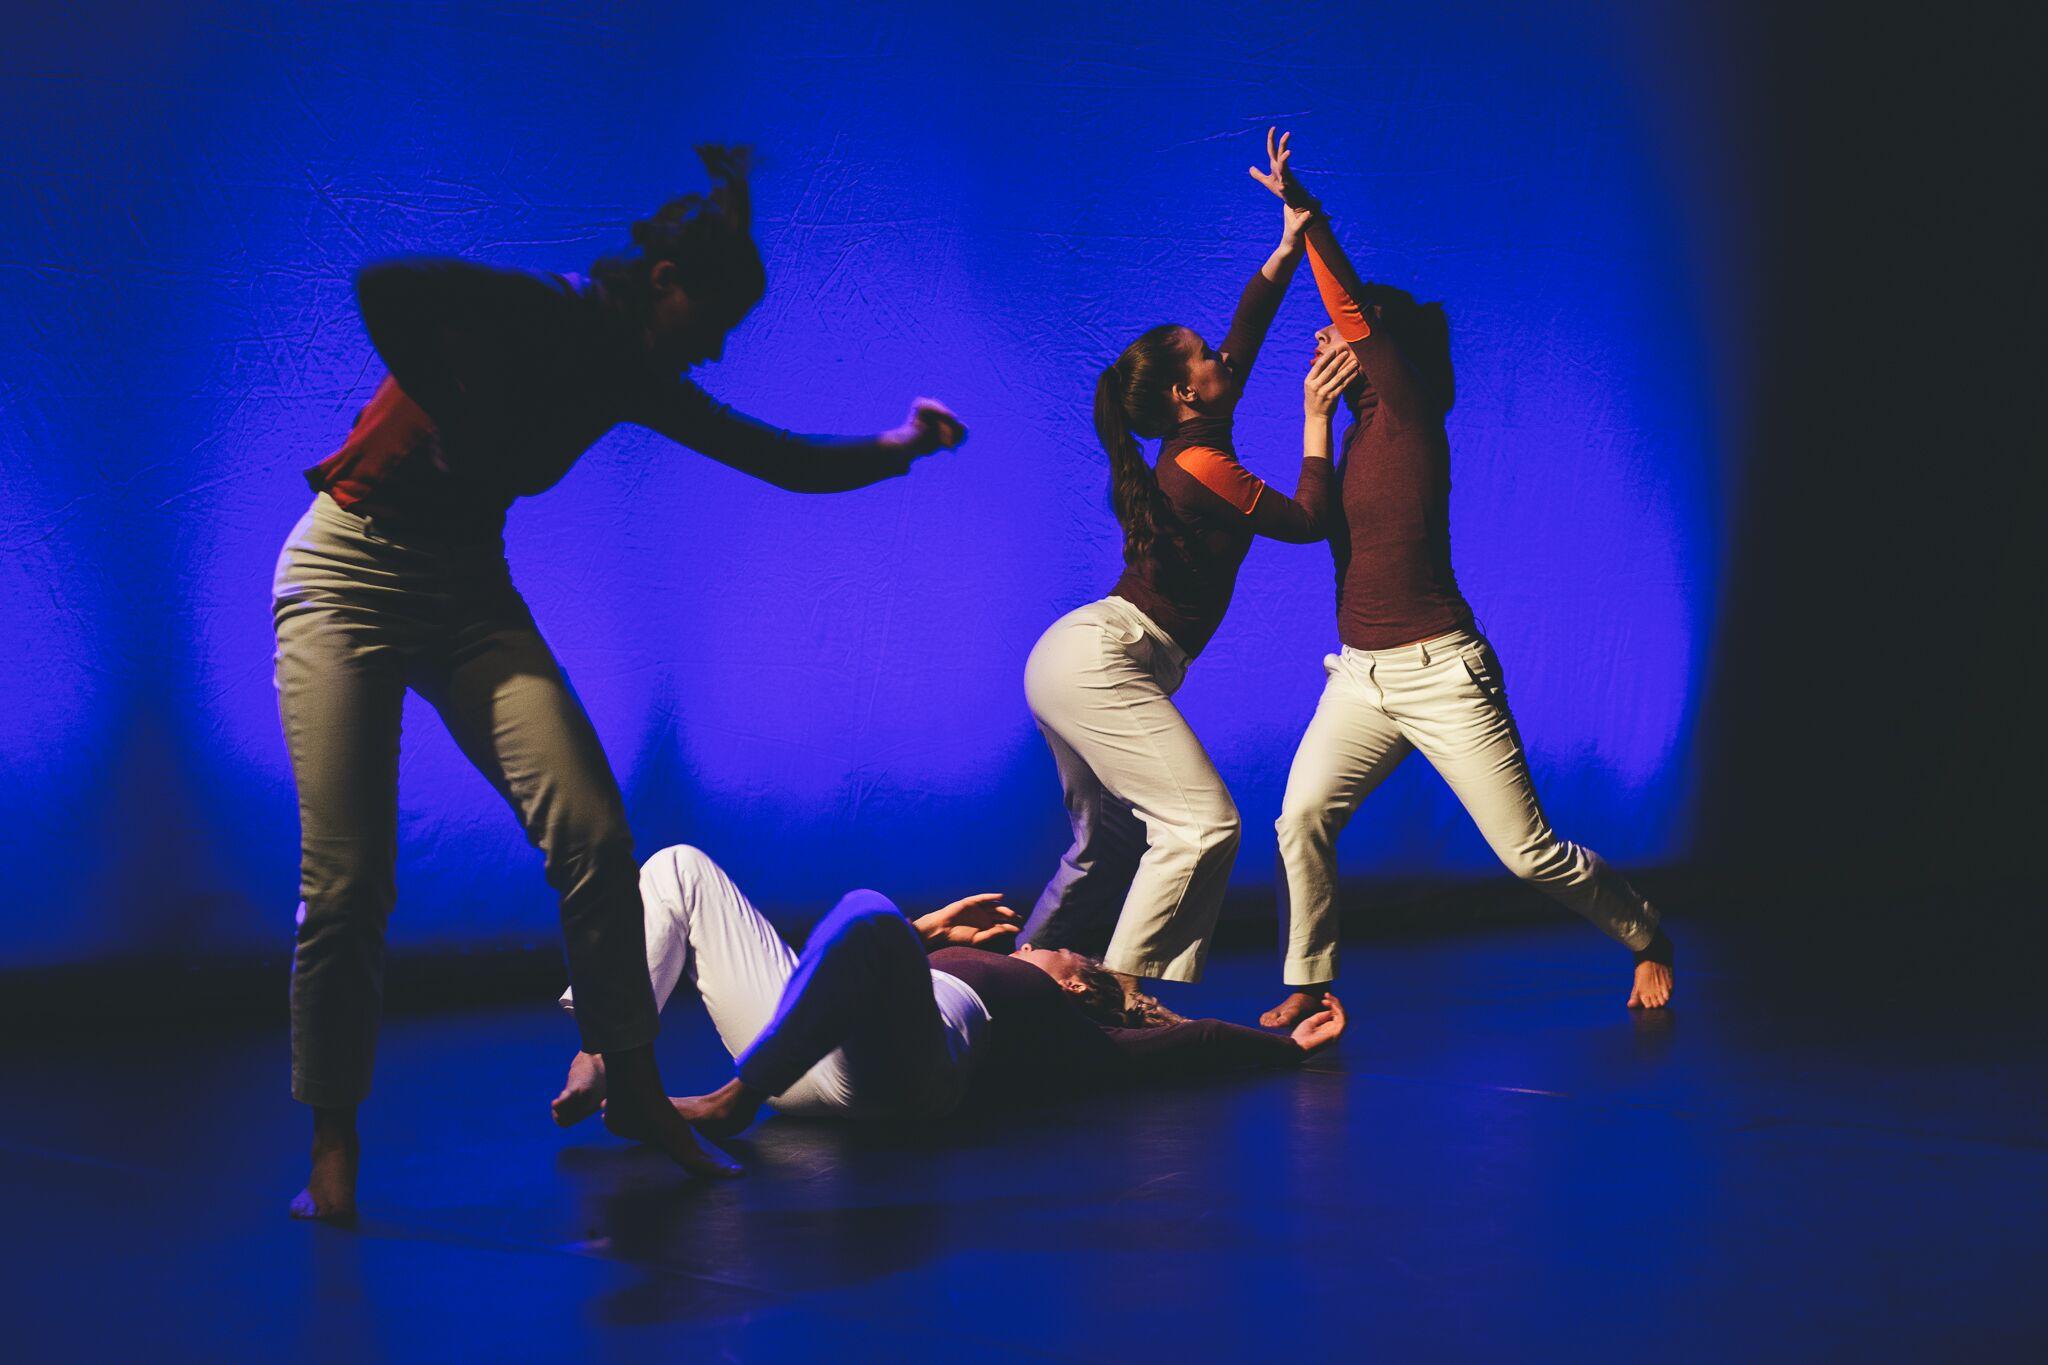 Dancers: Taryn Lavery, Hailley Laurèn, Lucy Wilson, Alex Miller